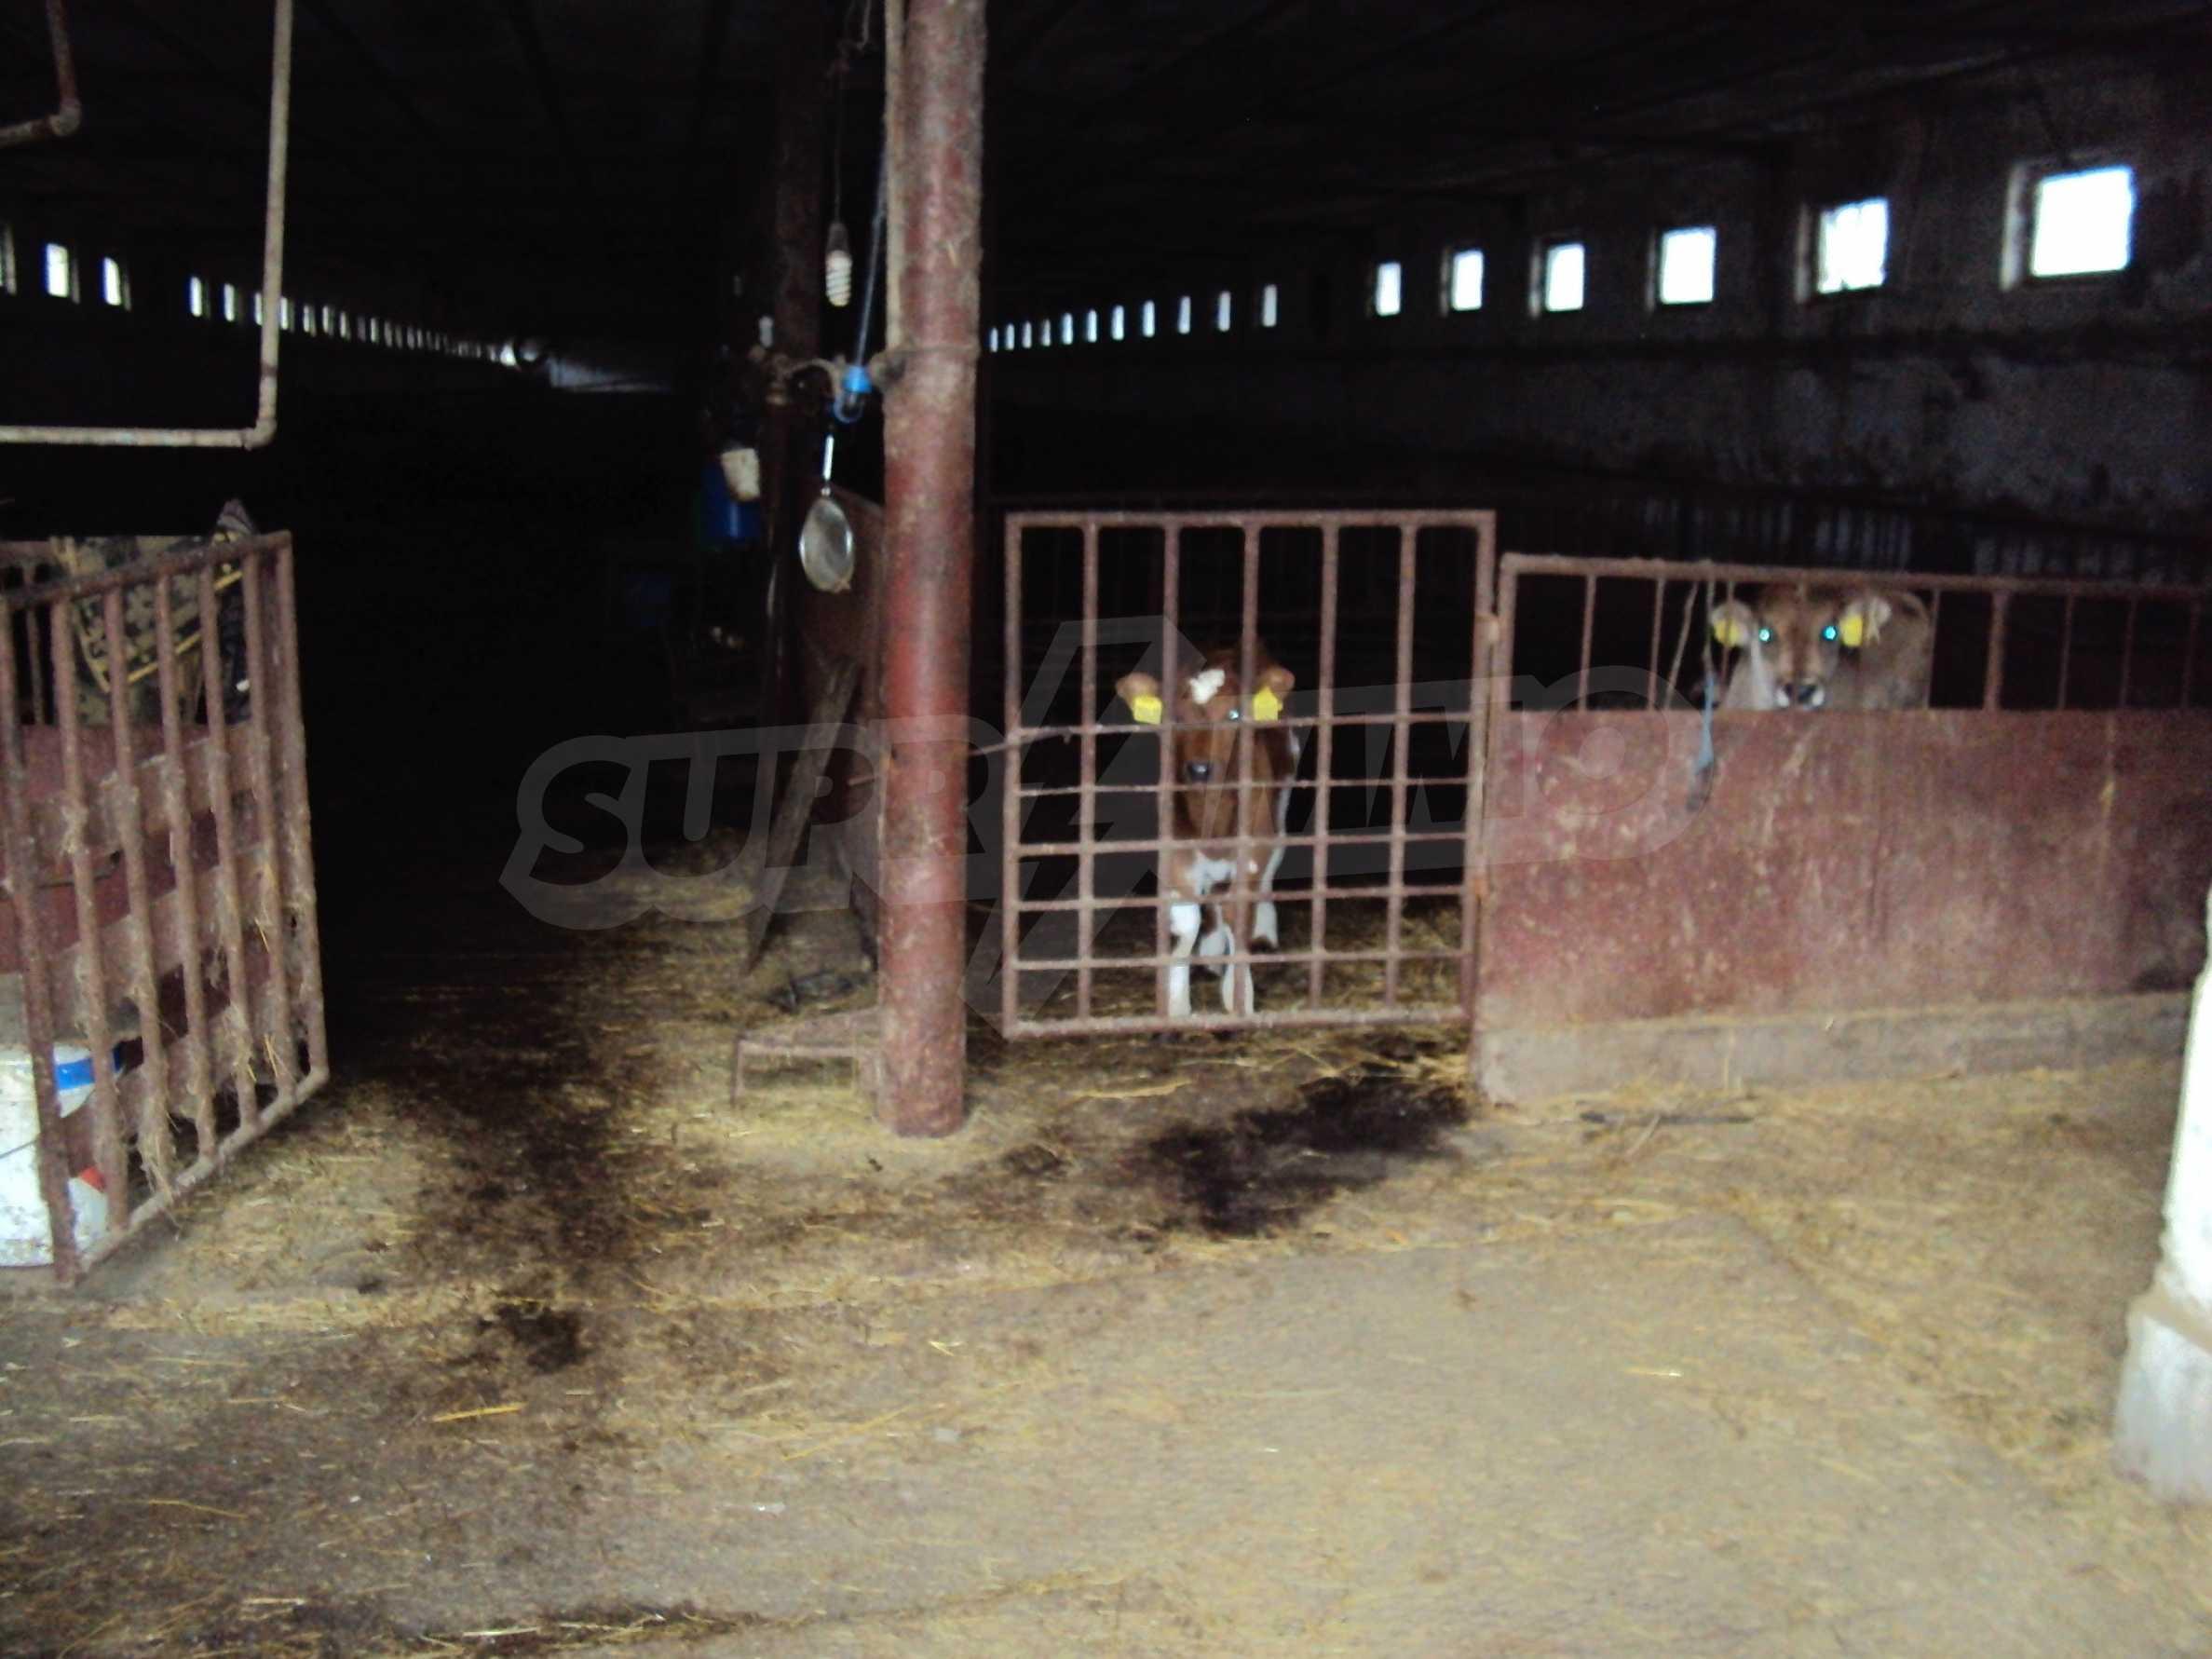 Farm in a small town 24 km from Veliko Tarnovo 12